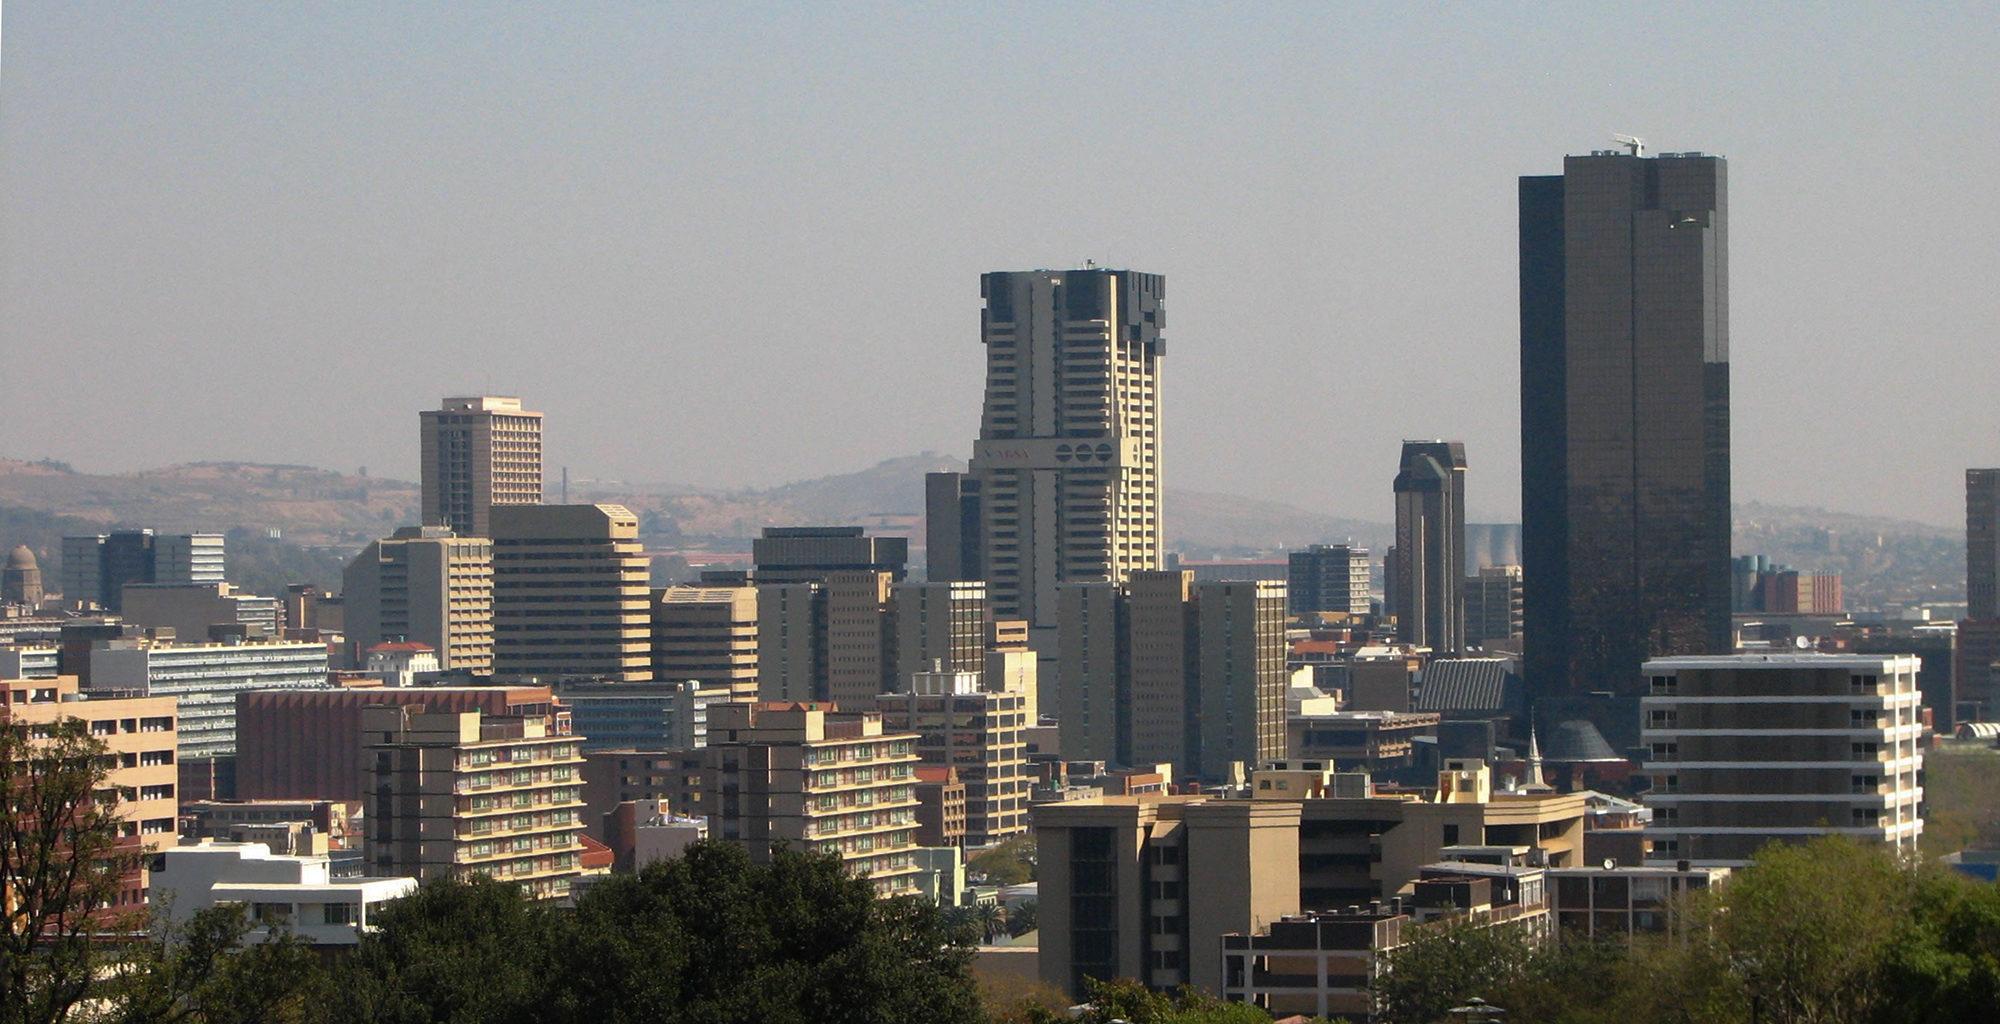 South-Africa-Johannesburg-Pretoria-Landscape